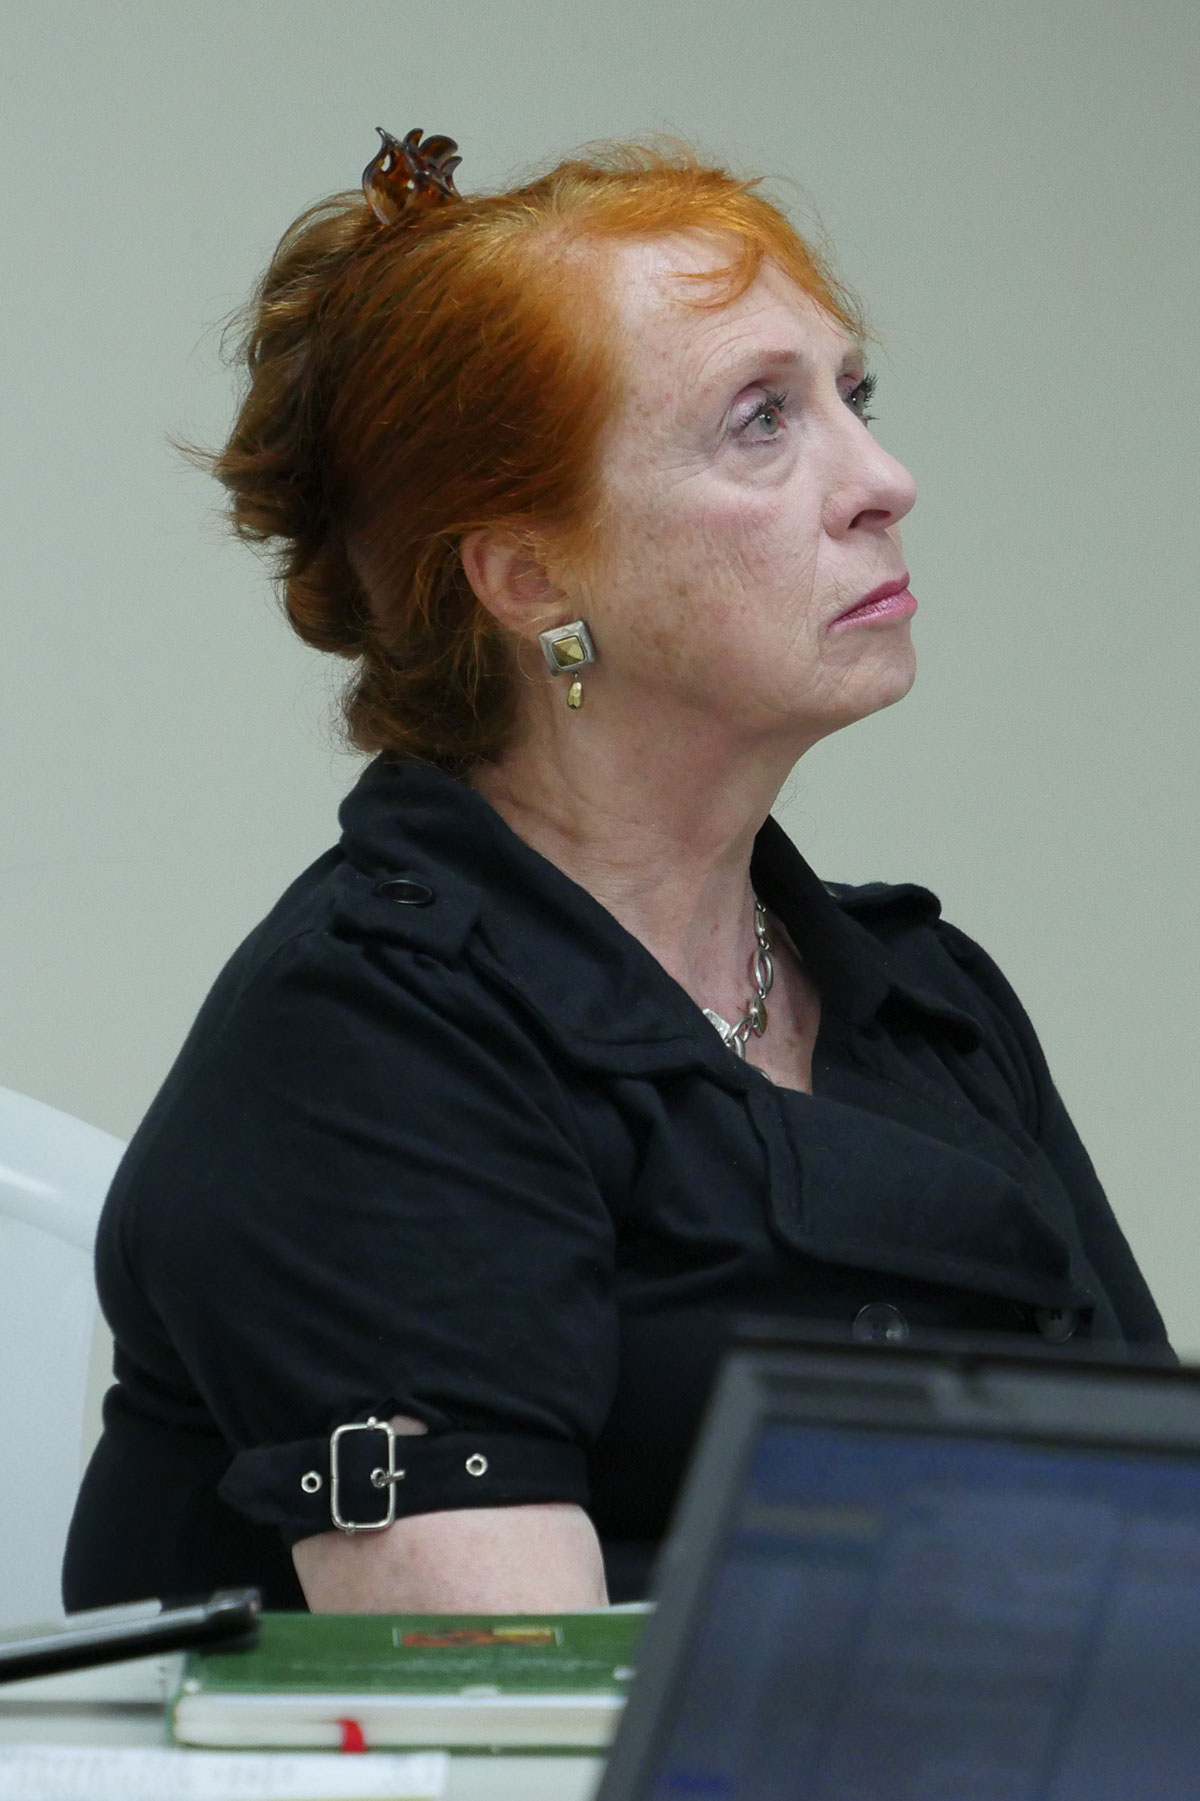 韋黛安博士(Dr. Diane M. Poythress)